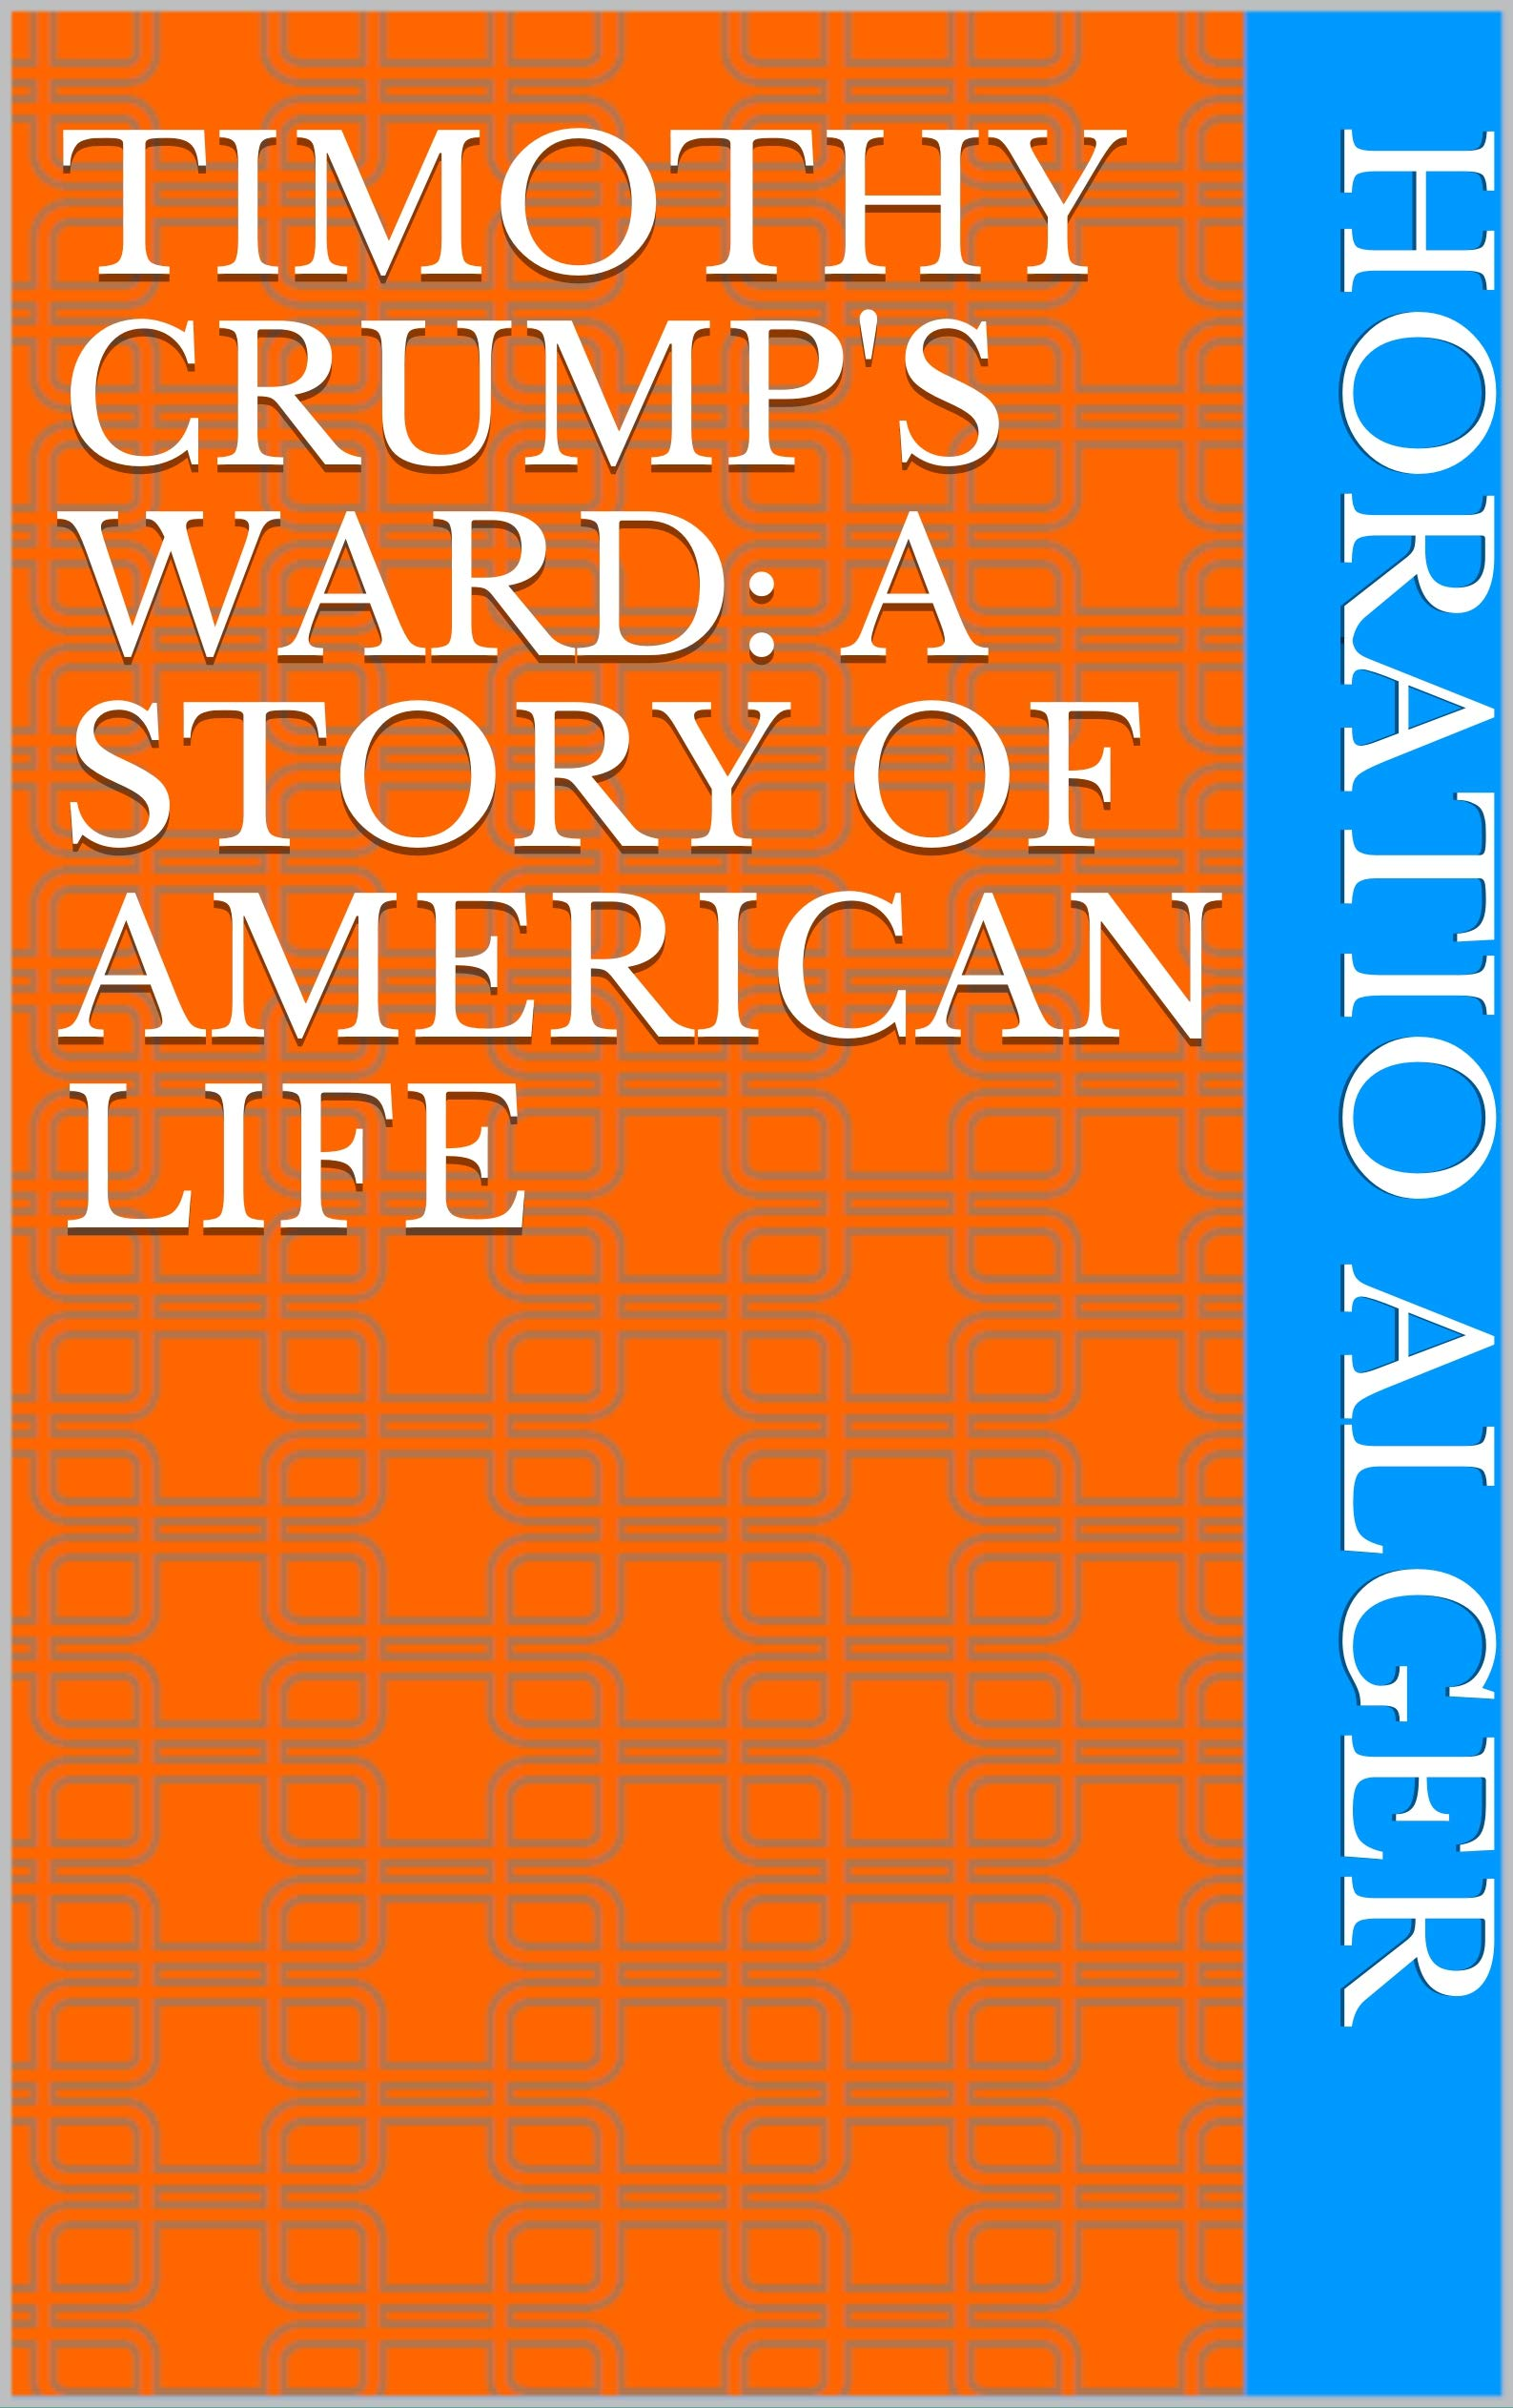 Timothy Crump's Ward: A Story of American Life